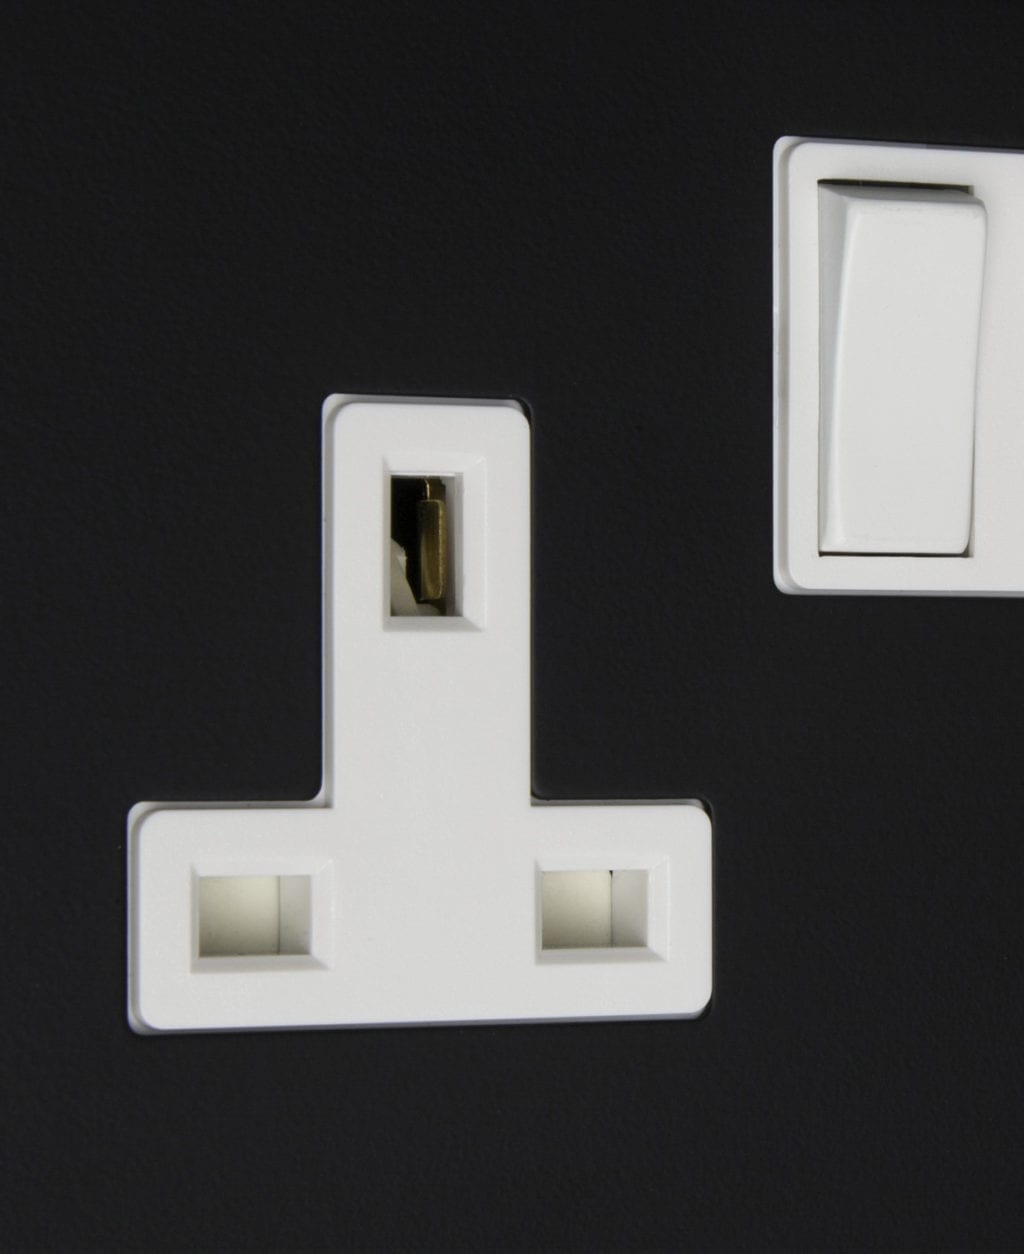 black and white double 2g plug socket close up